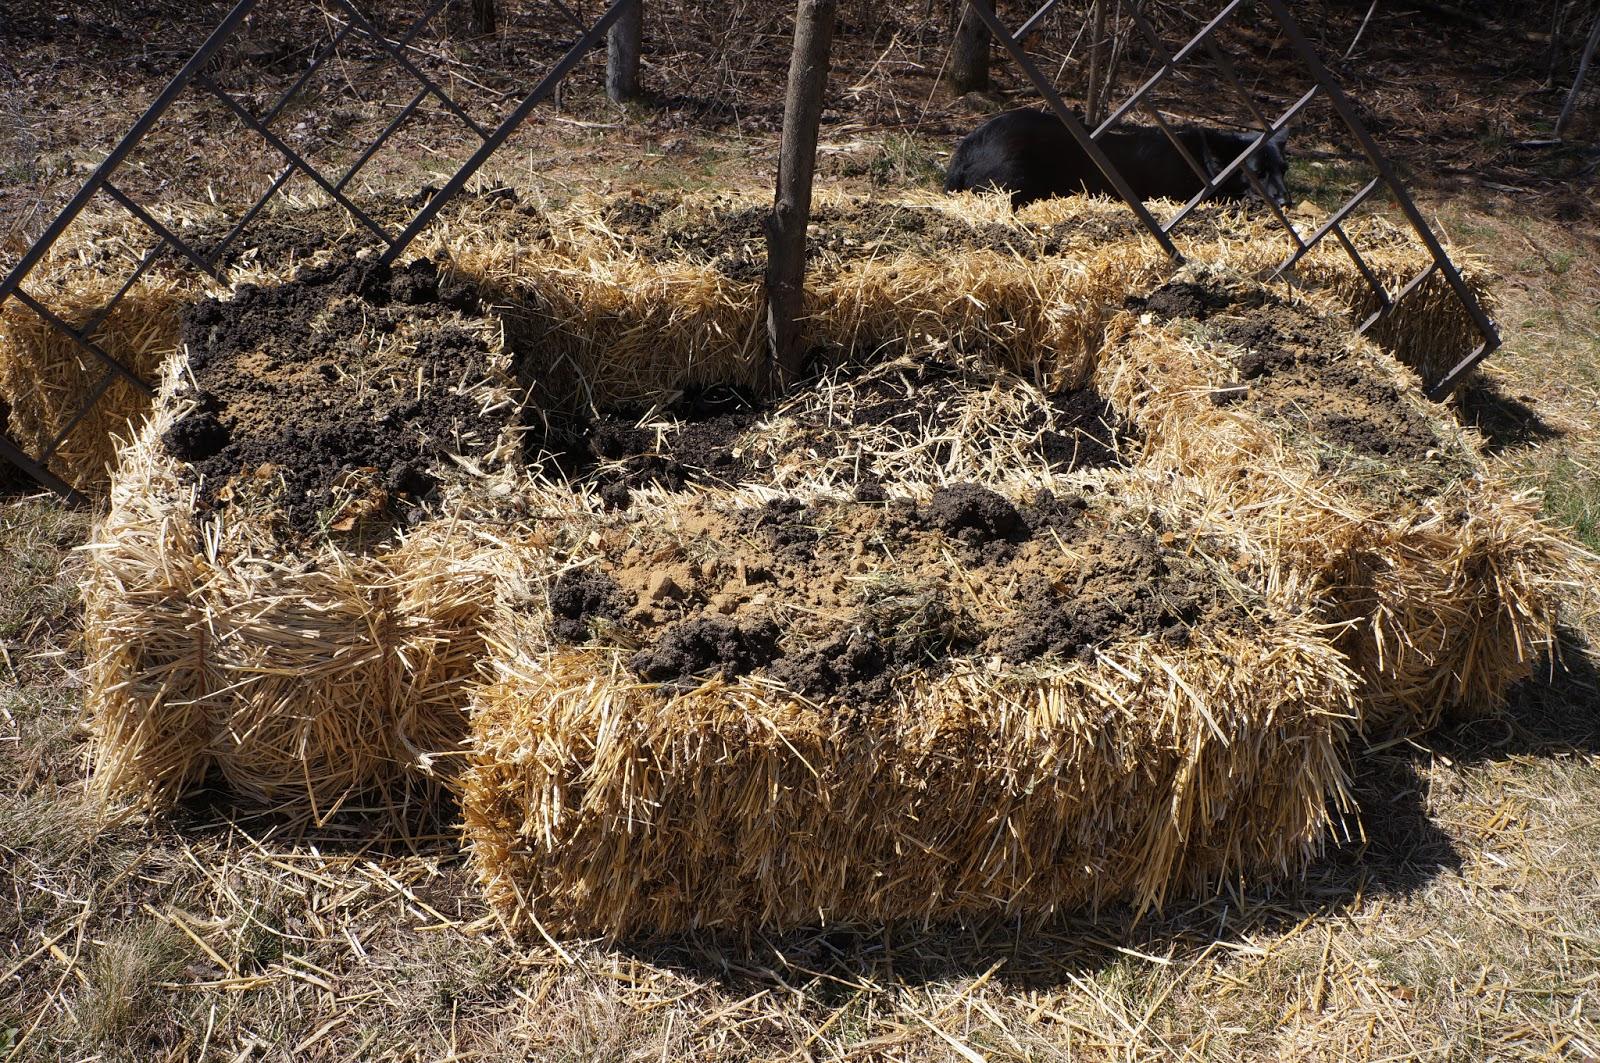 The Backyard Farming Connection: Gardening Methods: Straw Bale Gardening